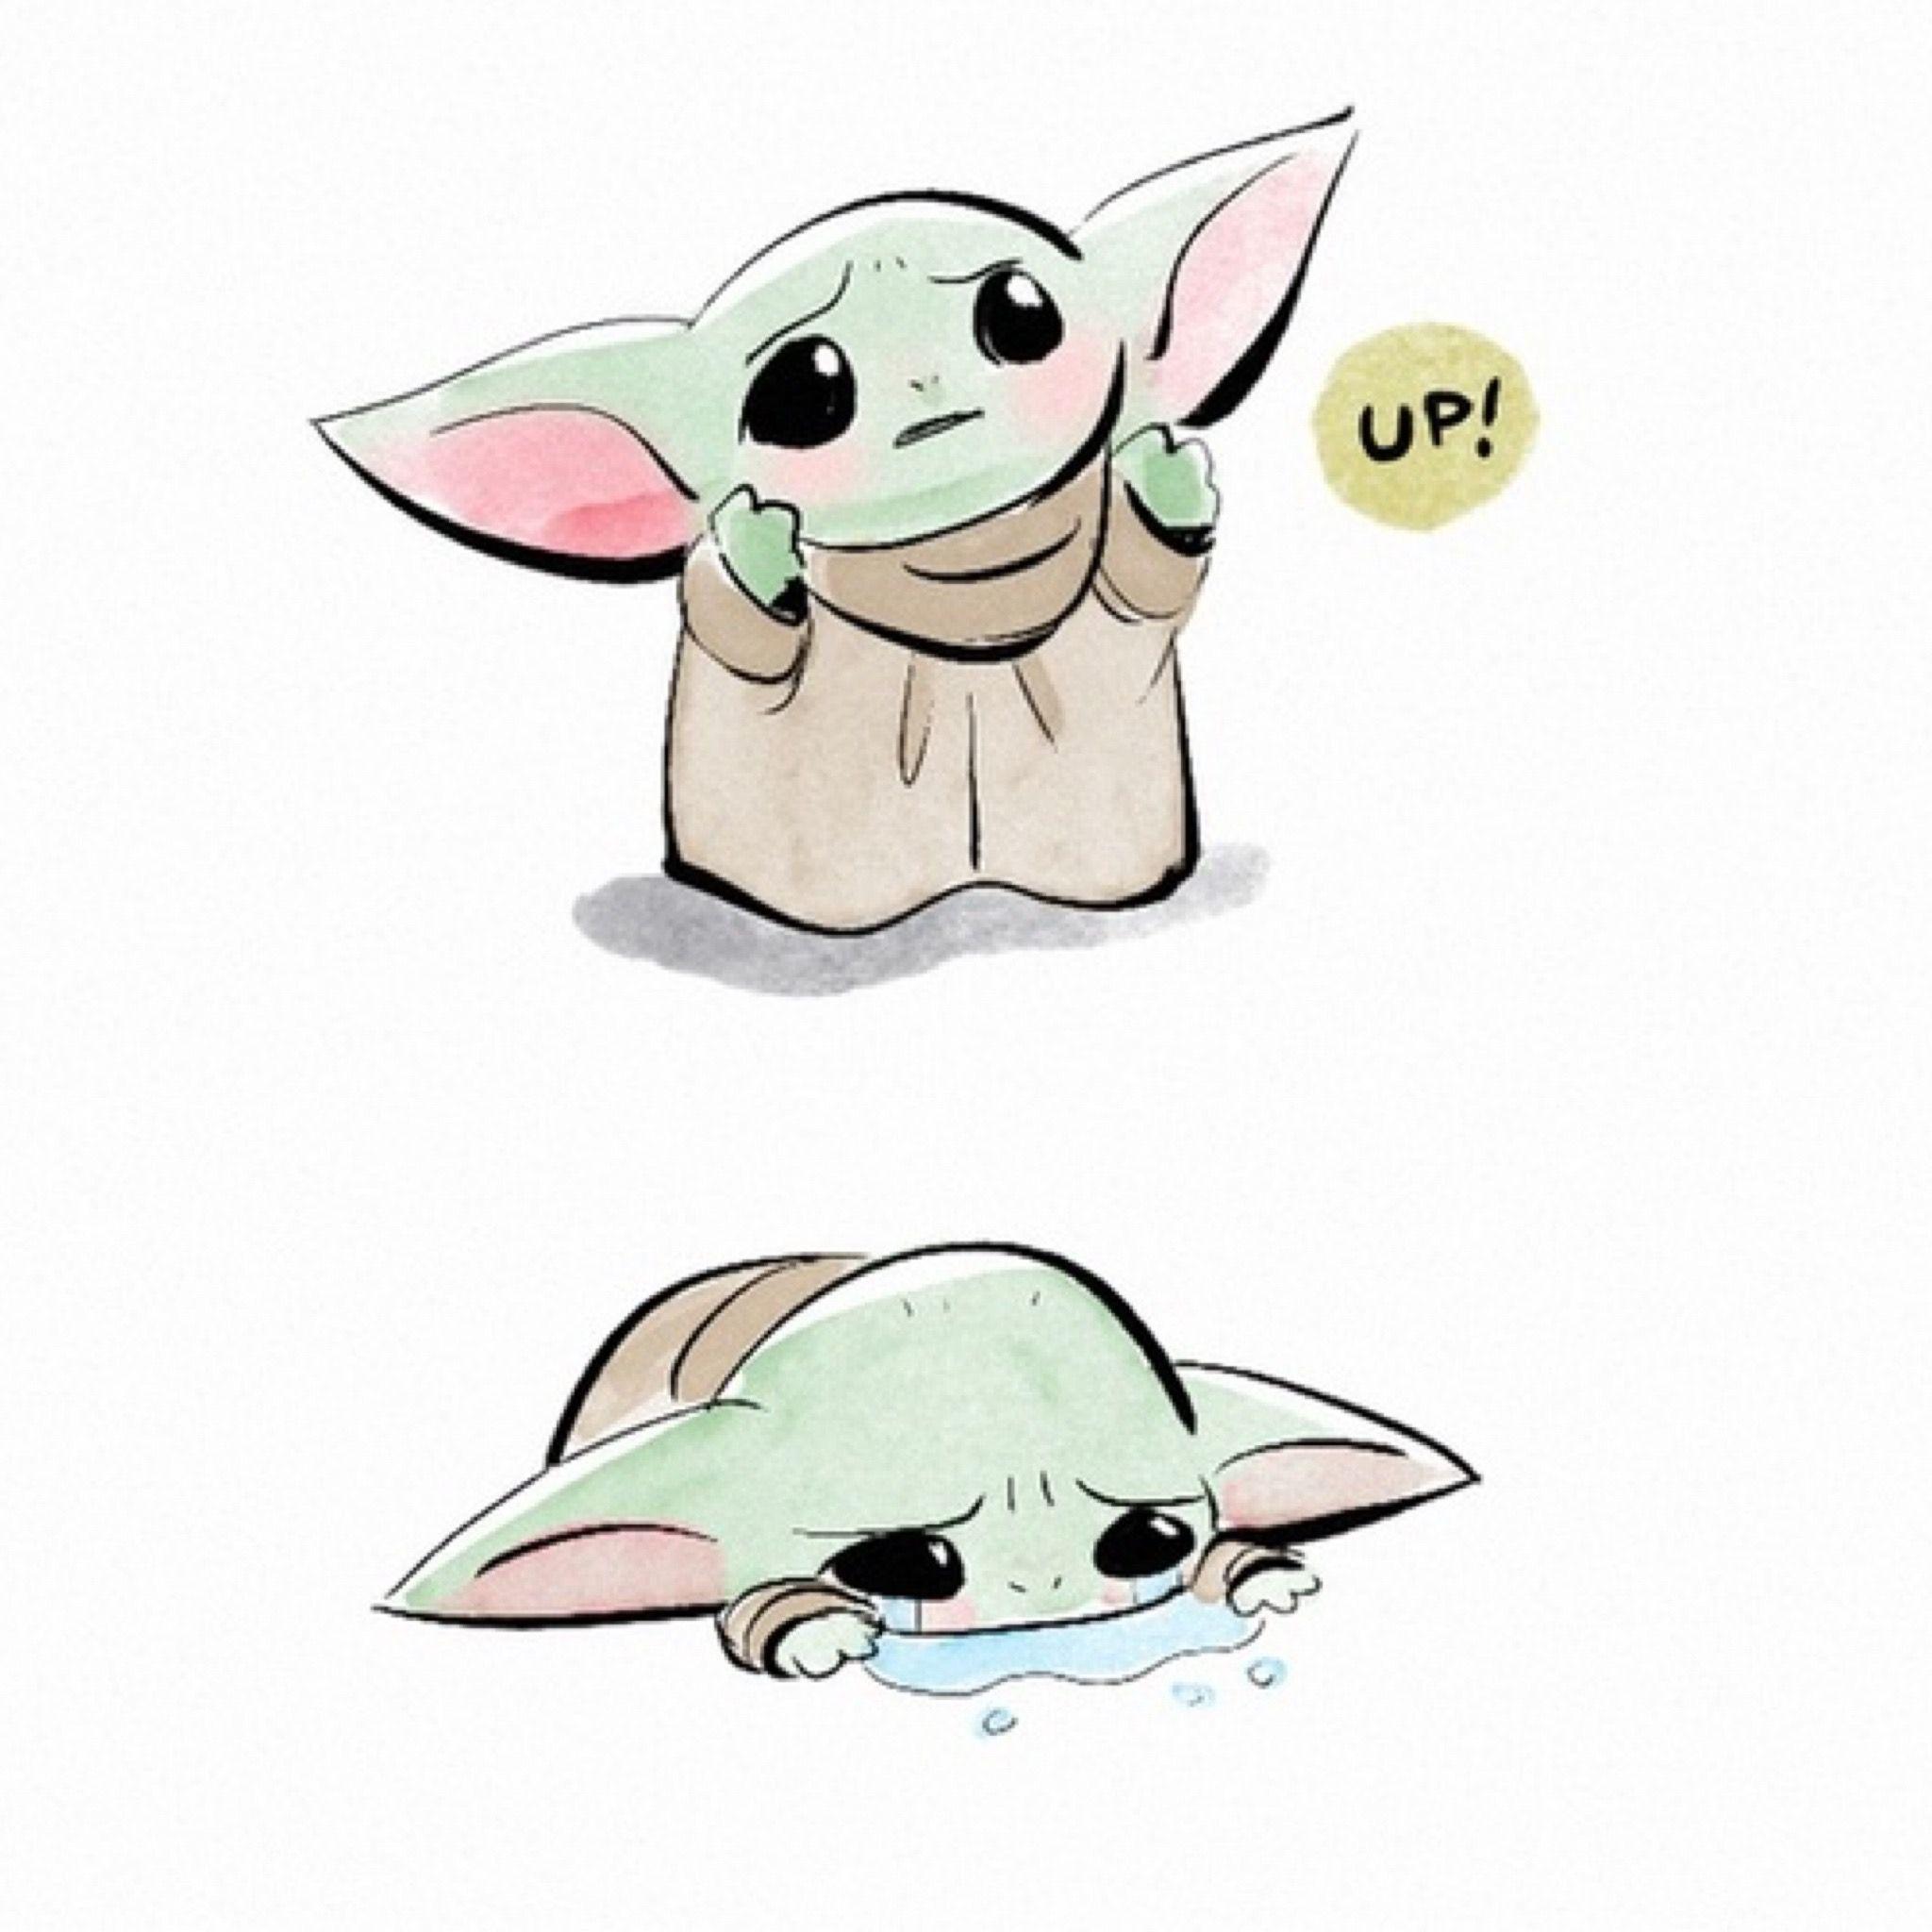 Baby Yoda Startv The Mandalorian The Child Aka Baby Yoda Star Wars Baby Yoda Startv The Mandalorian Cute Cartoon Drawings Star Wars Baby Yoda Drawing